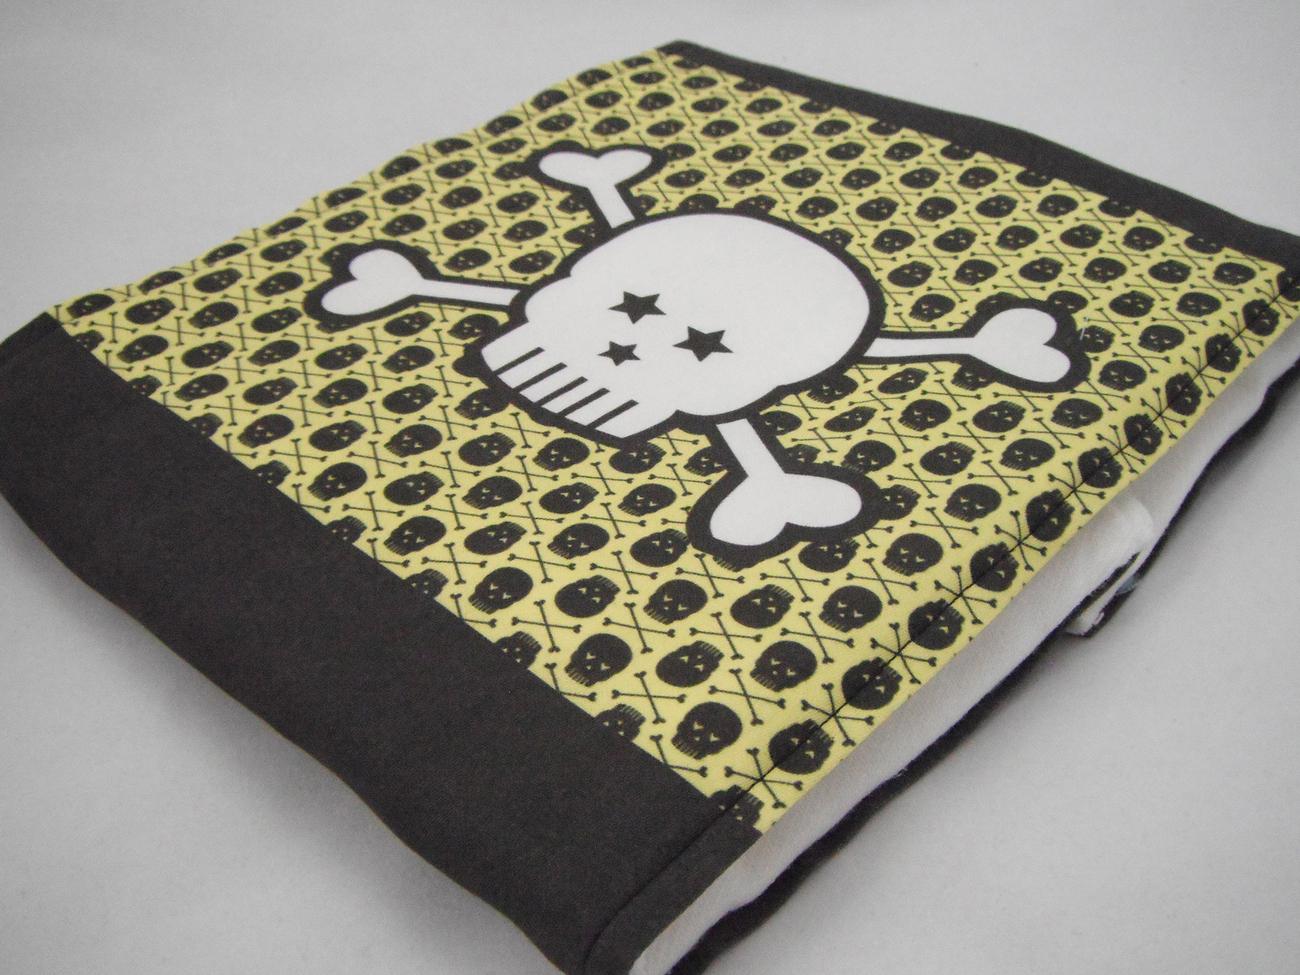 Premium 6 Ply Burp Cloth - Yellow Black Mini Skulls Large Male White Skull Print